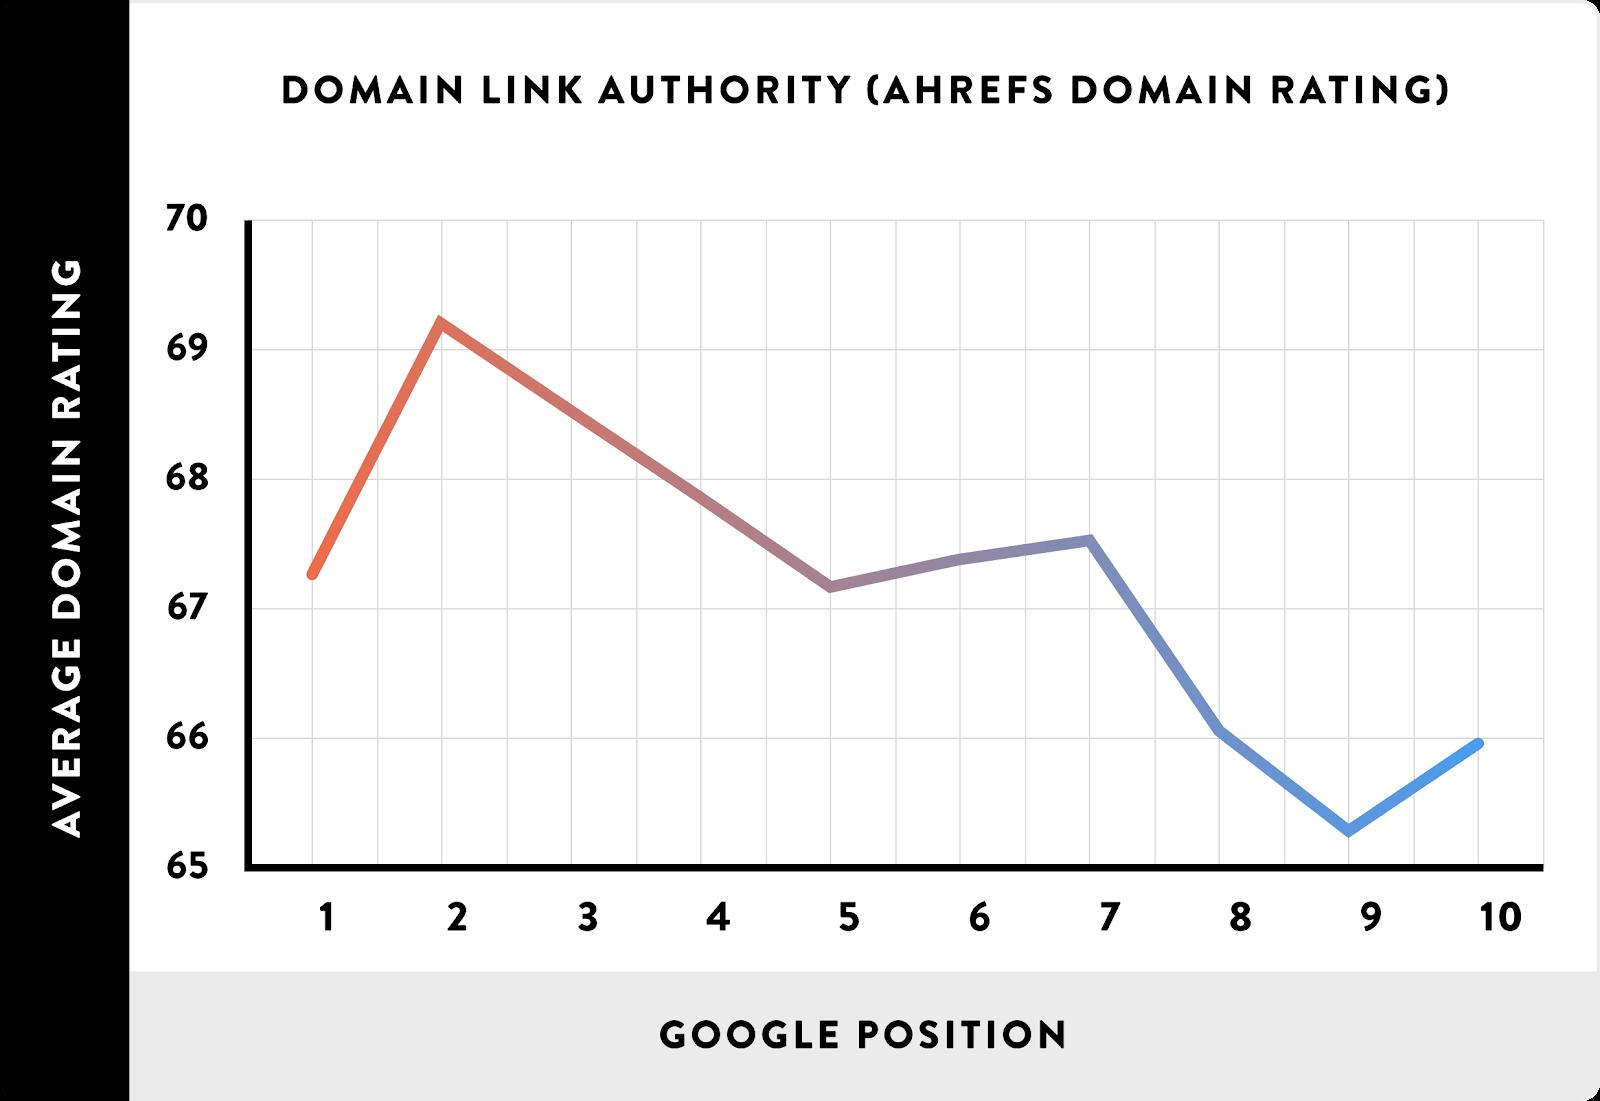 Domain Link Authority (ahrefs domain rating)